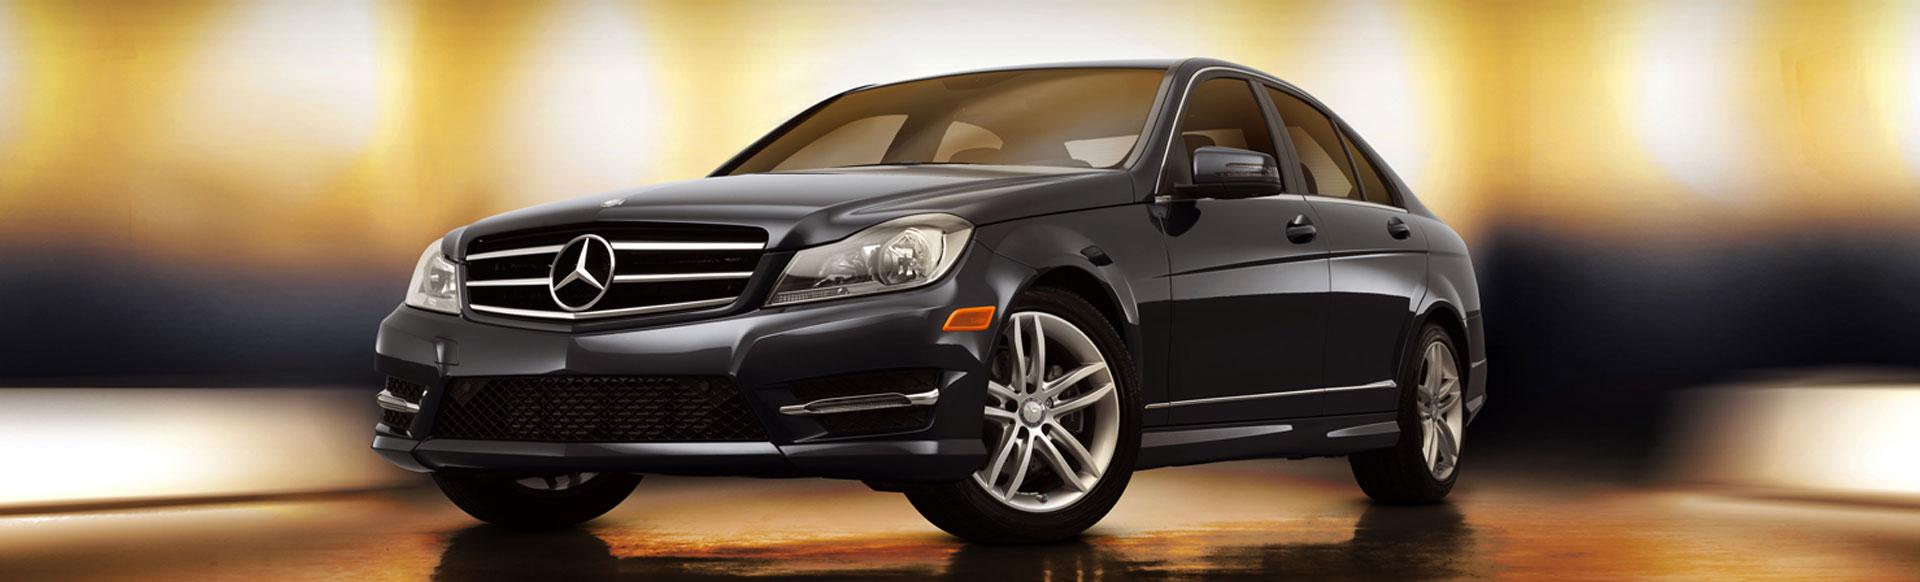 Virginia Beach Luxury Used Car Dealer BMW VW Lexus Honda Ford ...